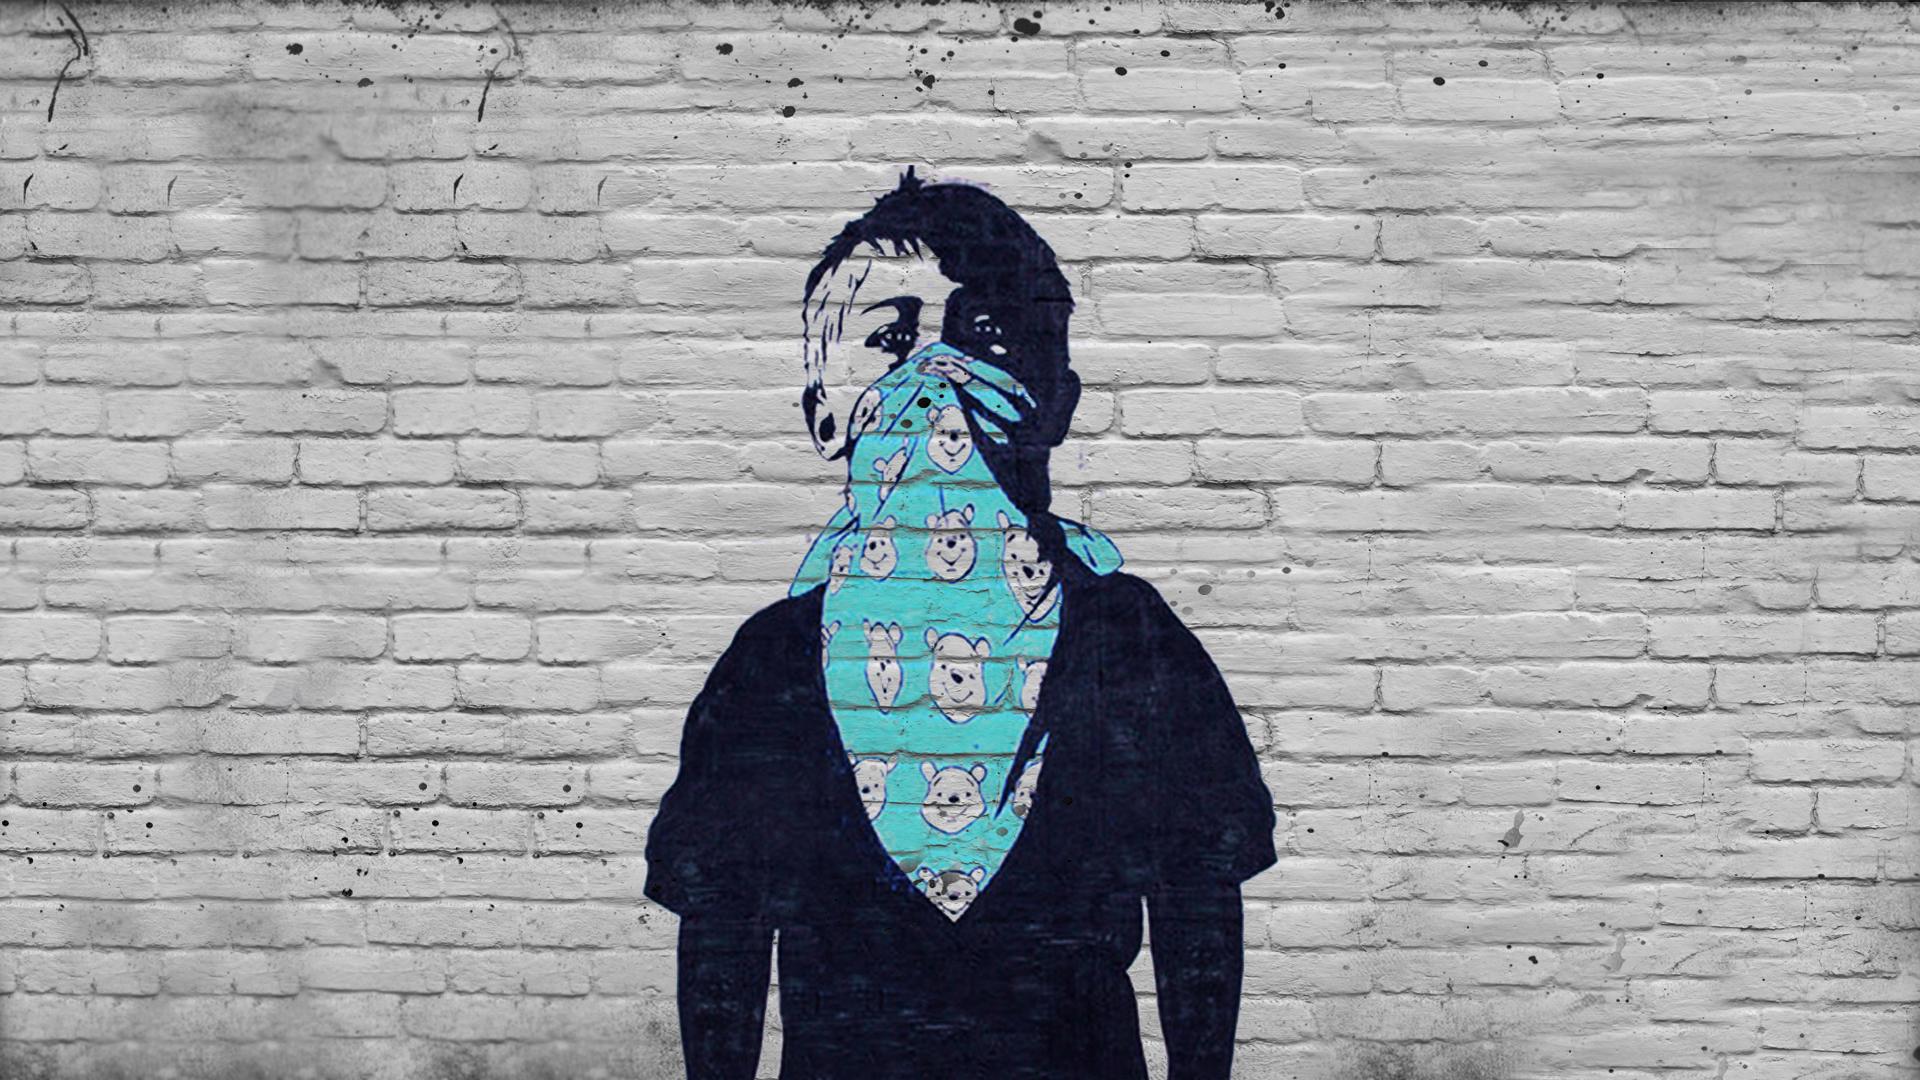 Graffiti Full HD Wallpaper And Background Image